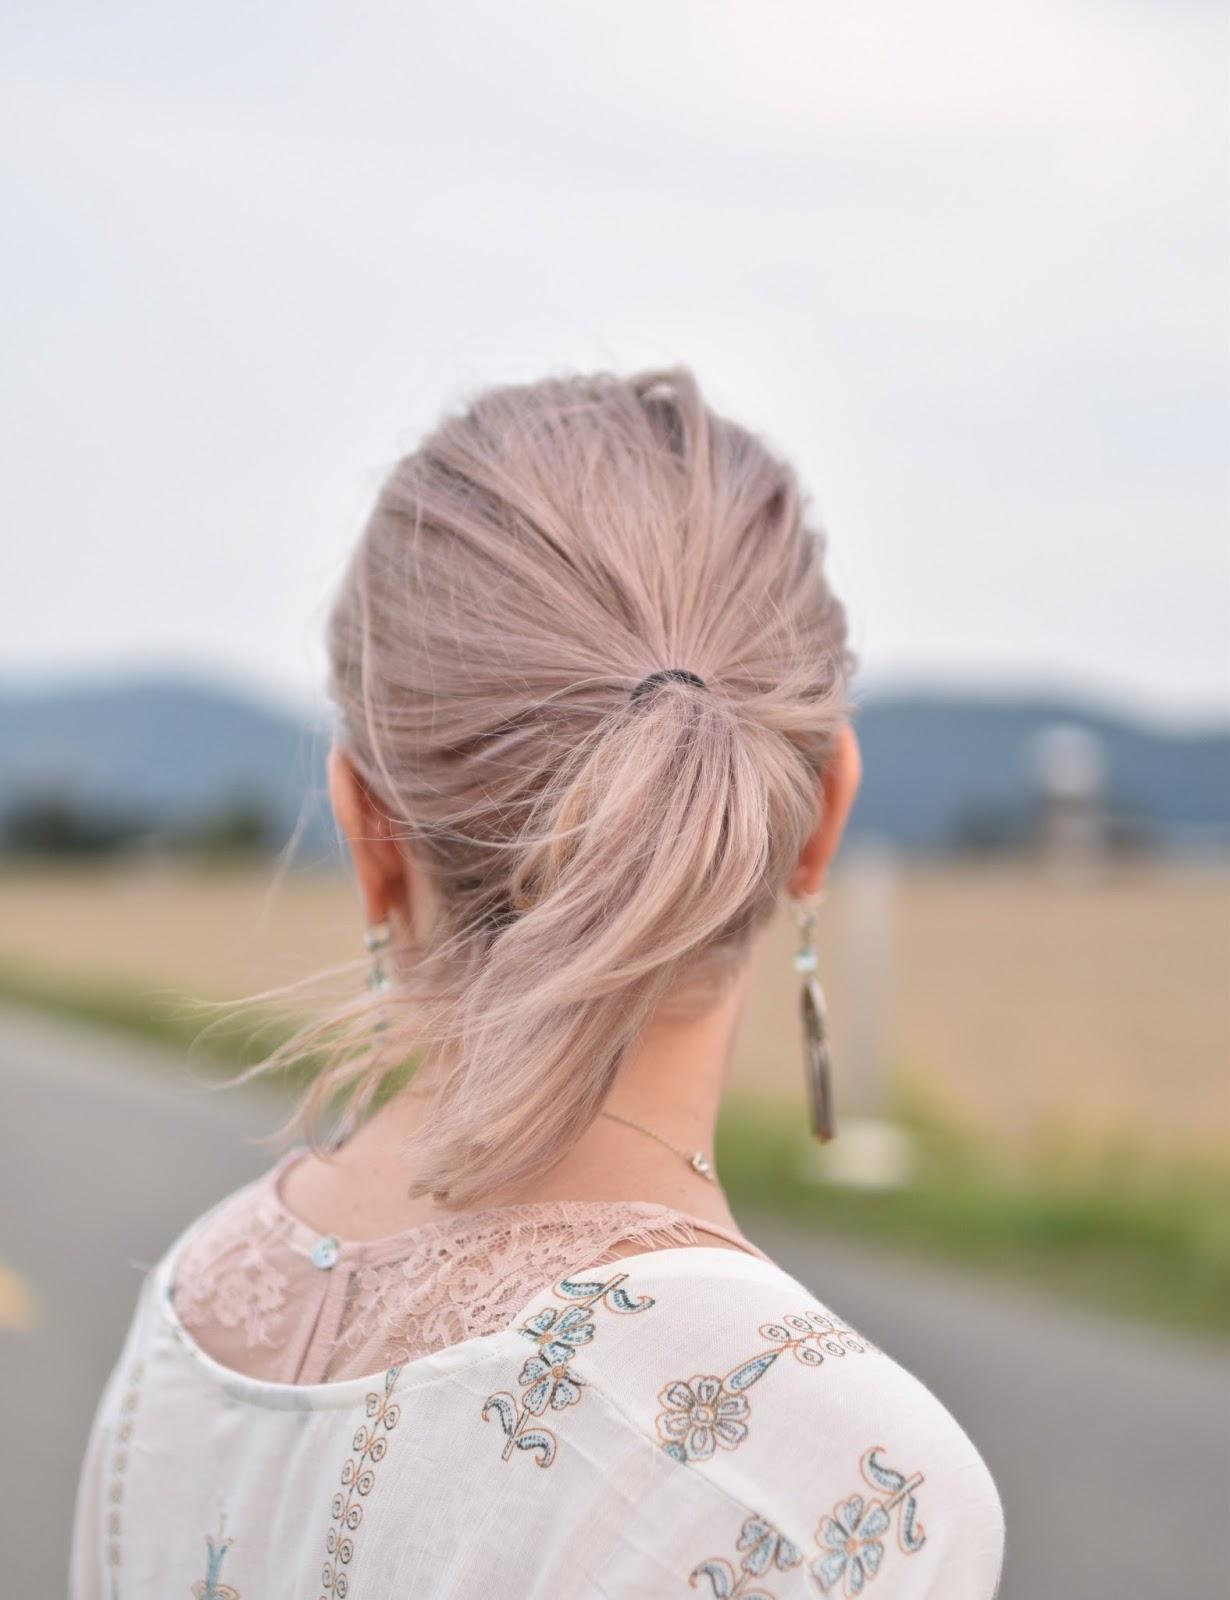 Monika Faulkner outfit inspiration - pink lace-trimmed camisole, white damask-patterned kimono